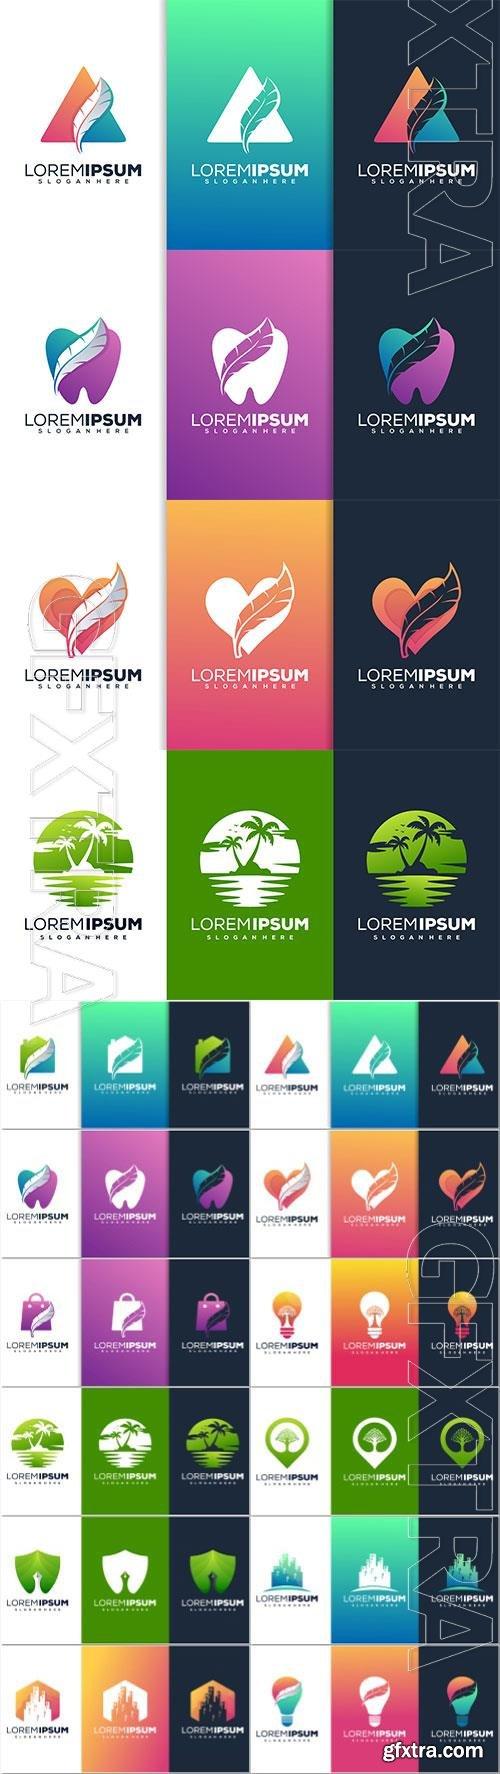 Modern with feather logo design Premium Vector